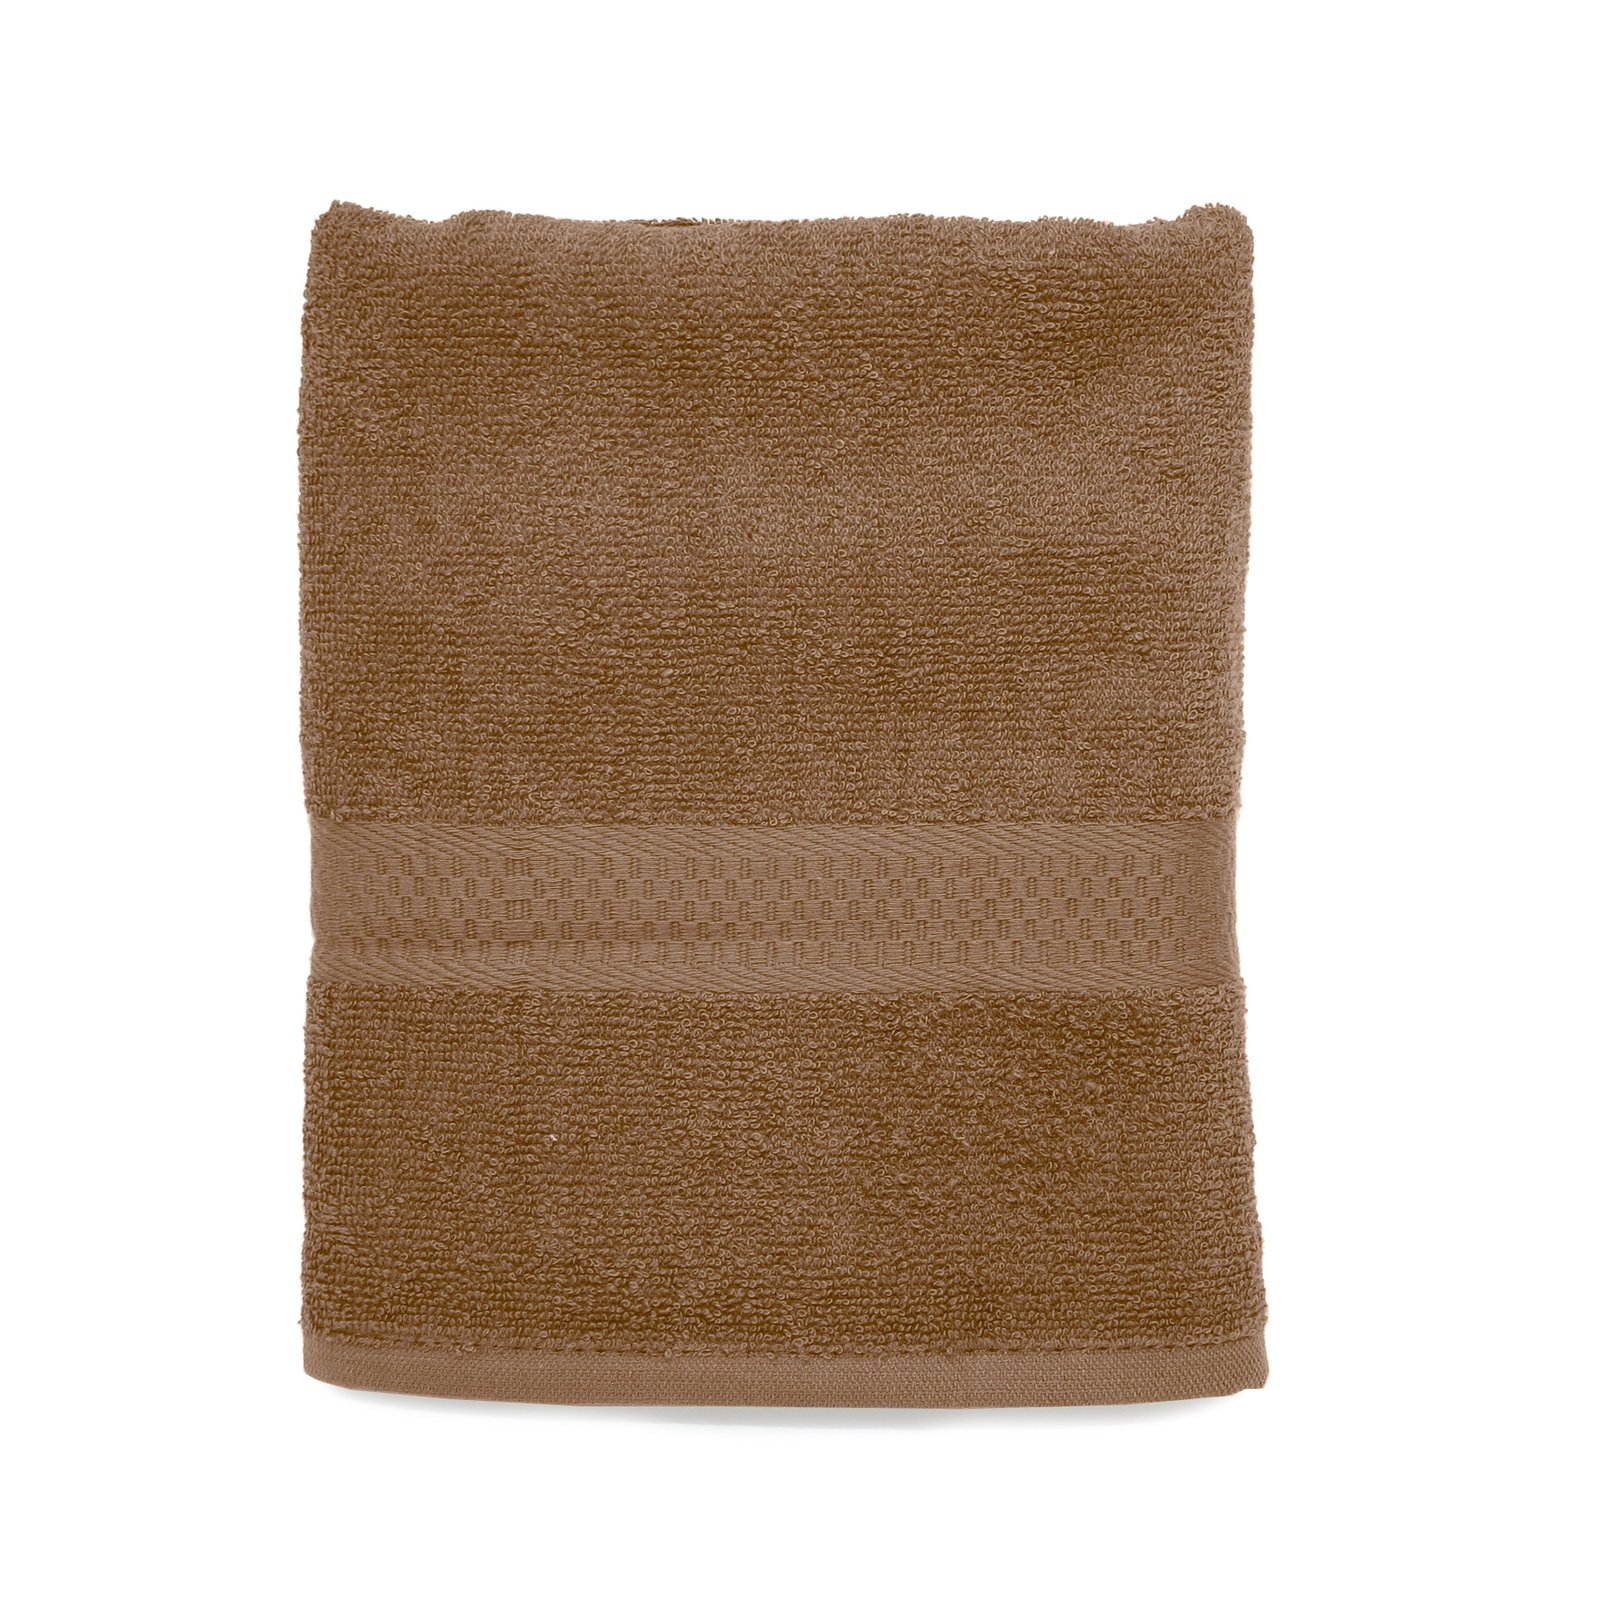 Полотенце банное Spany, 21311318179, махровое, коричневый, 50 х 90 см полотенце банное mona liza orchid цвет белый 50 х 90 см